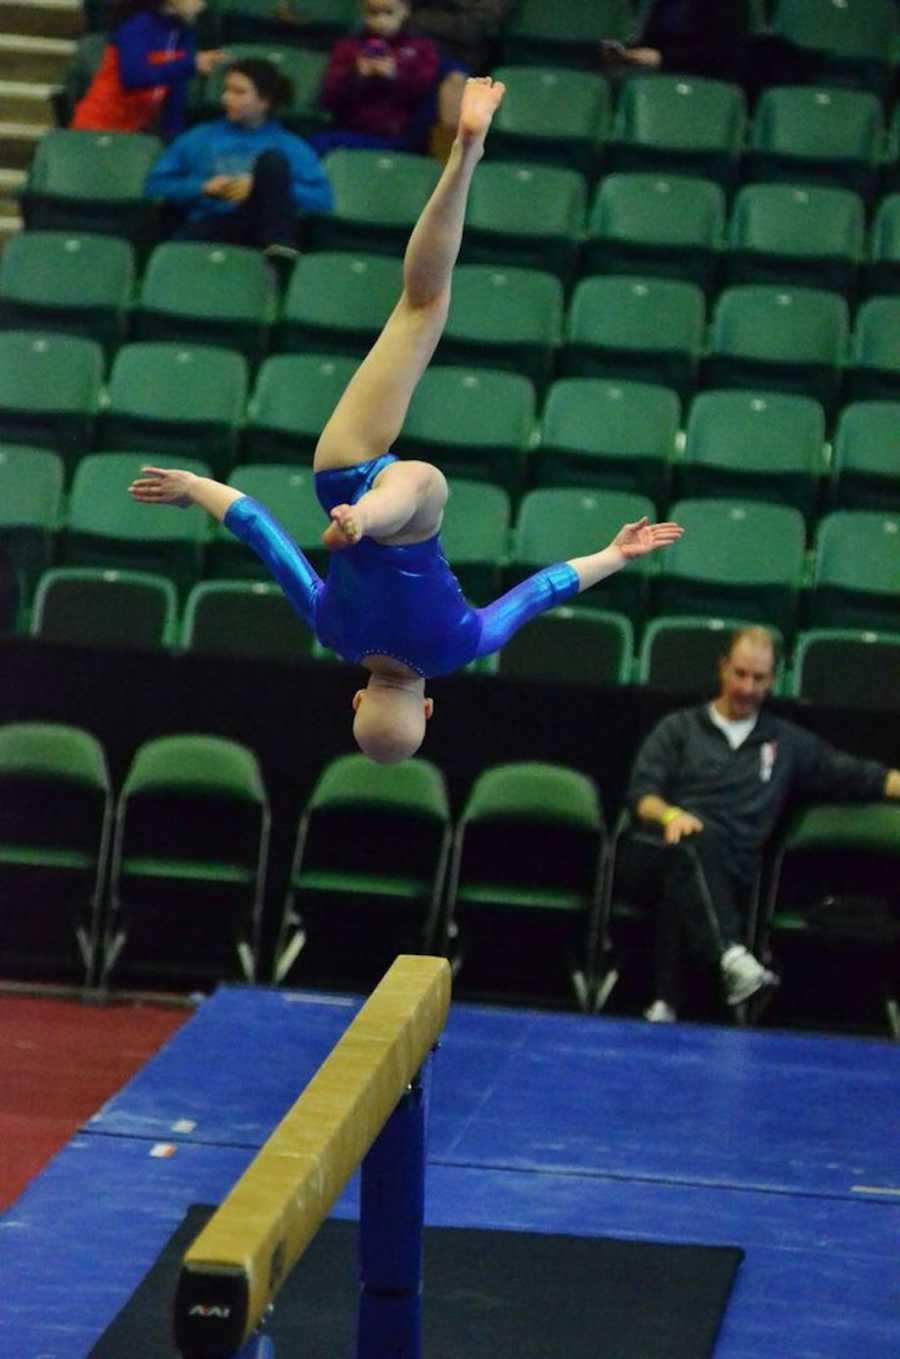 Gymnast with alopecia